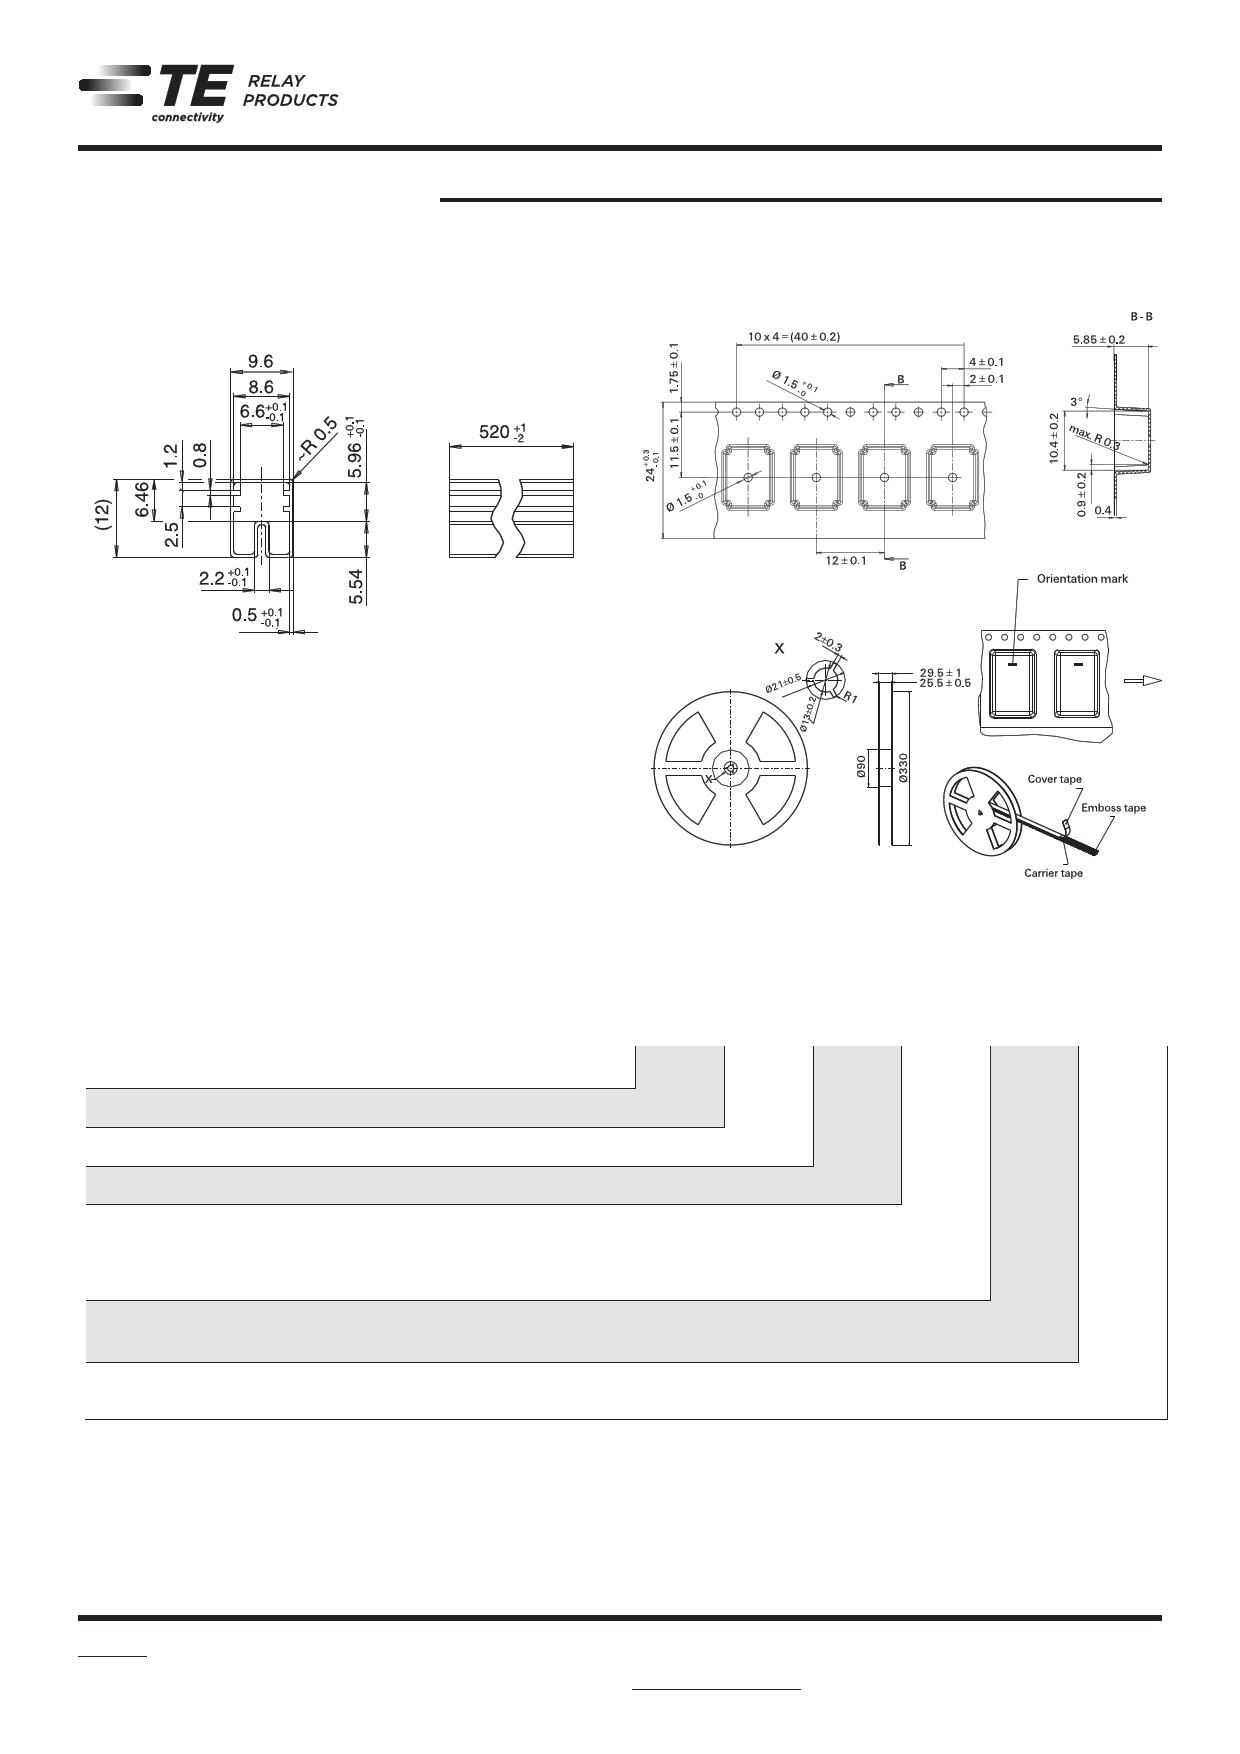 1-1462037-8 pdf, 반도체, 판매, 대치품